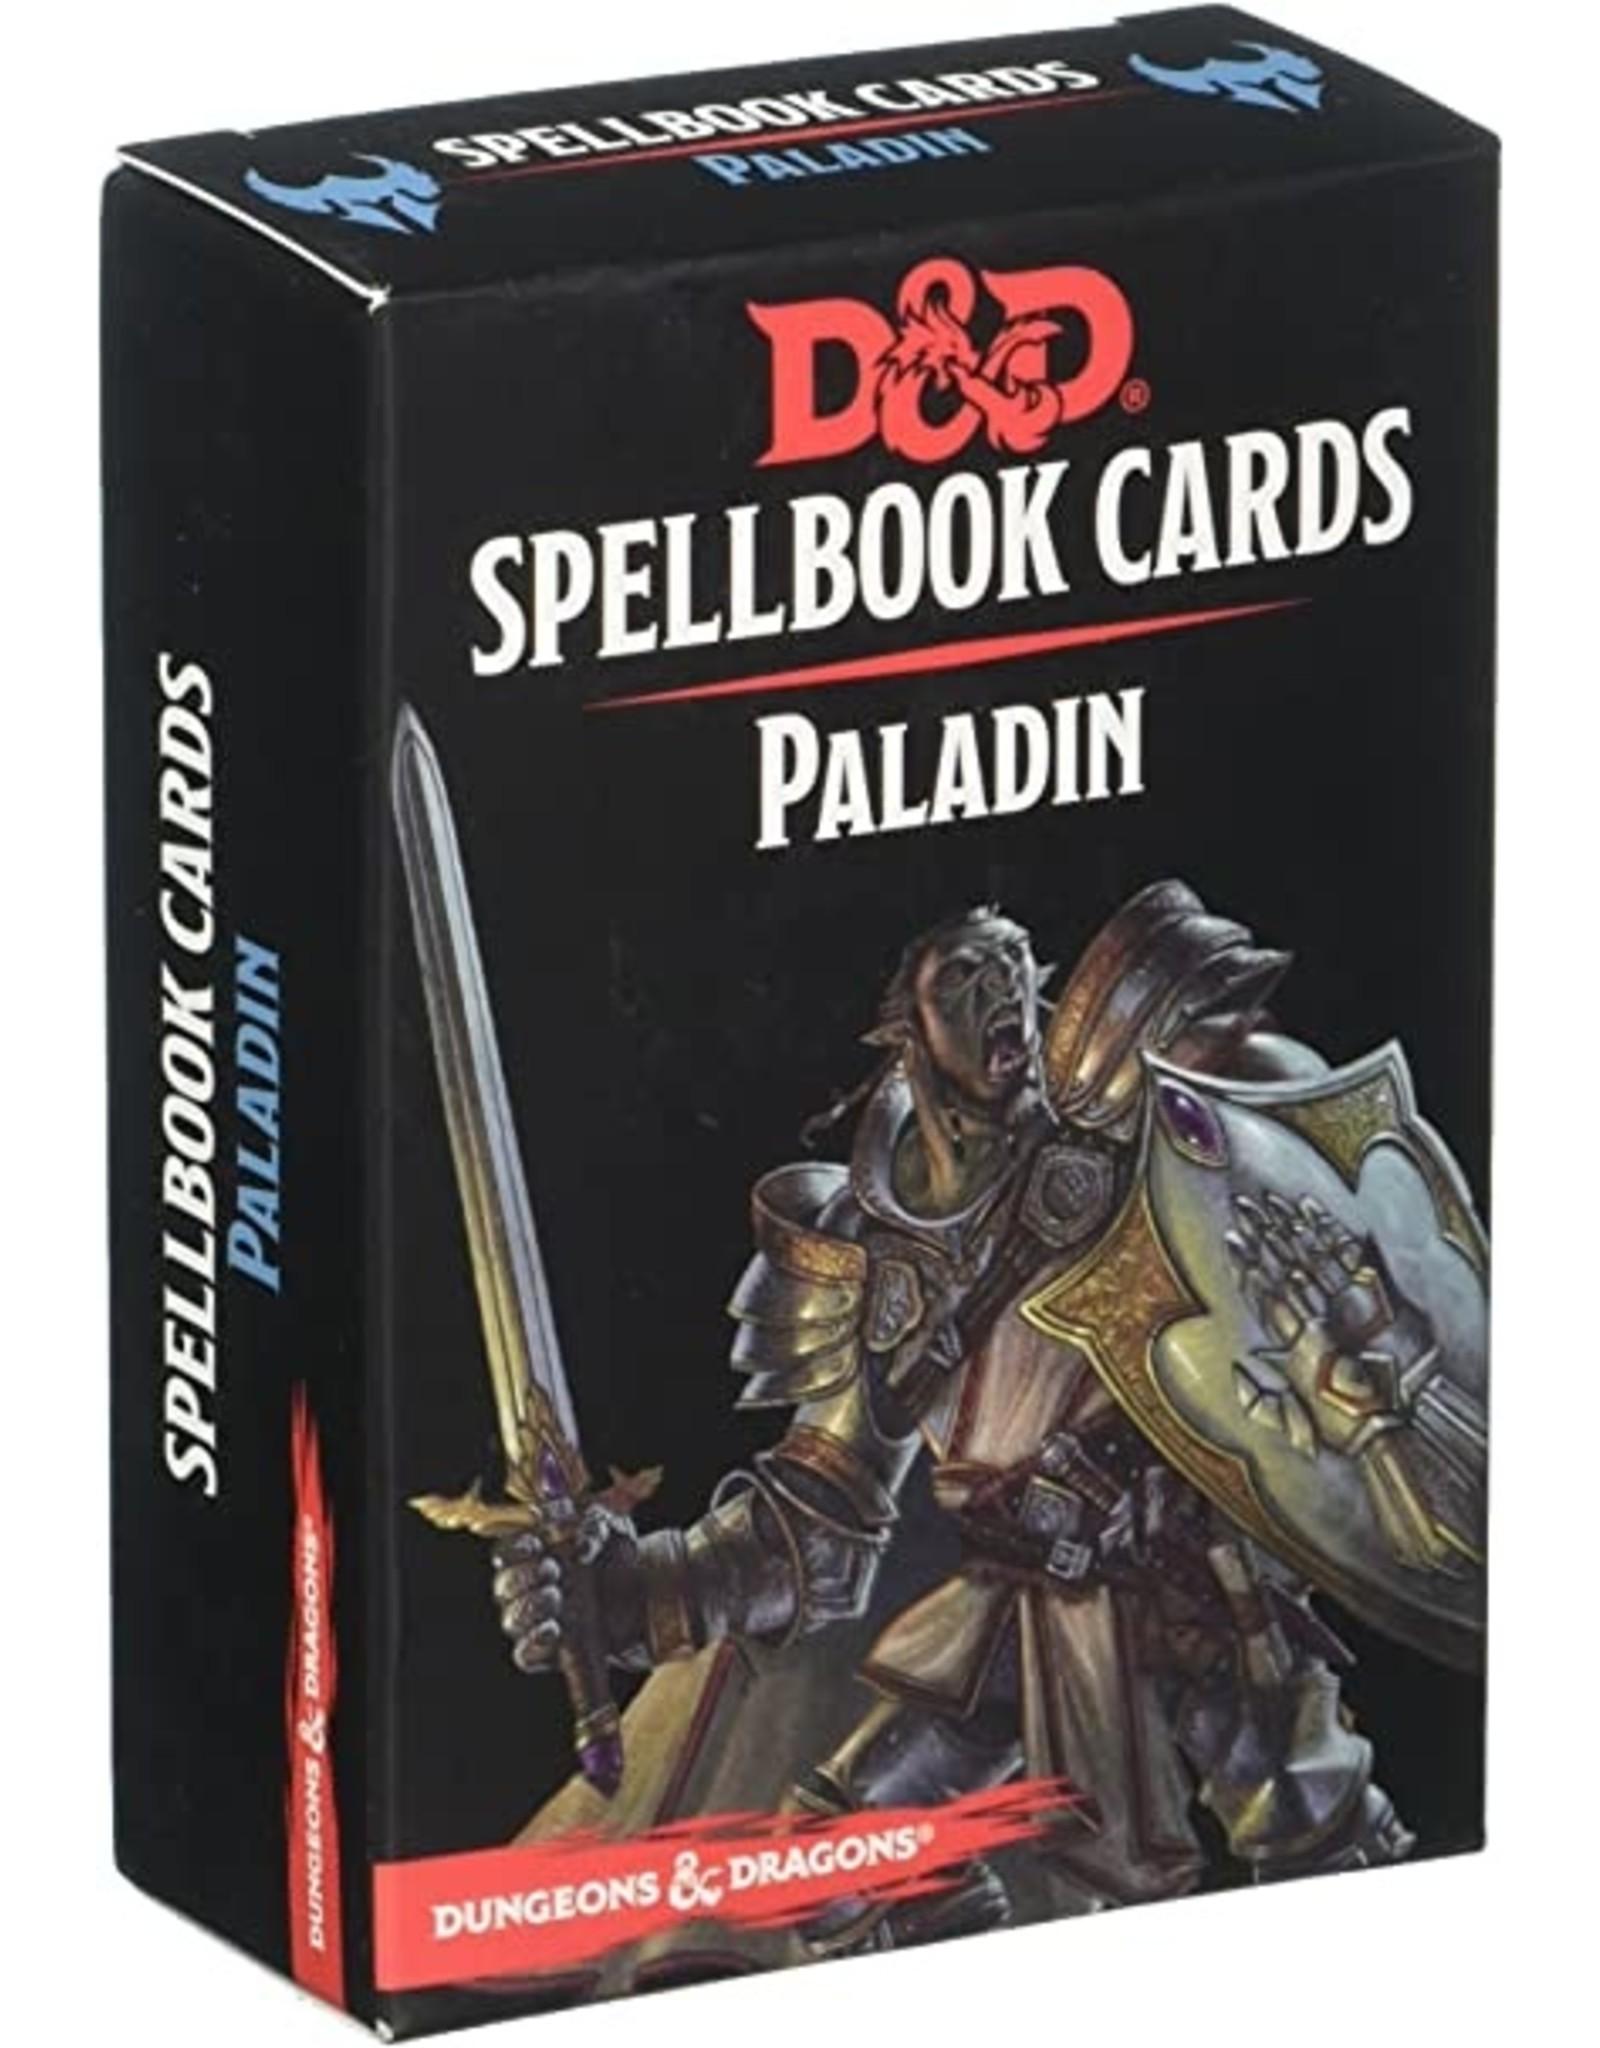 D&D Spellbook Cards: Paladin Deck